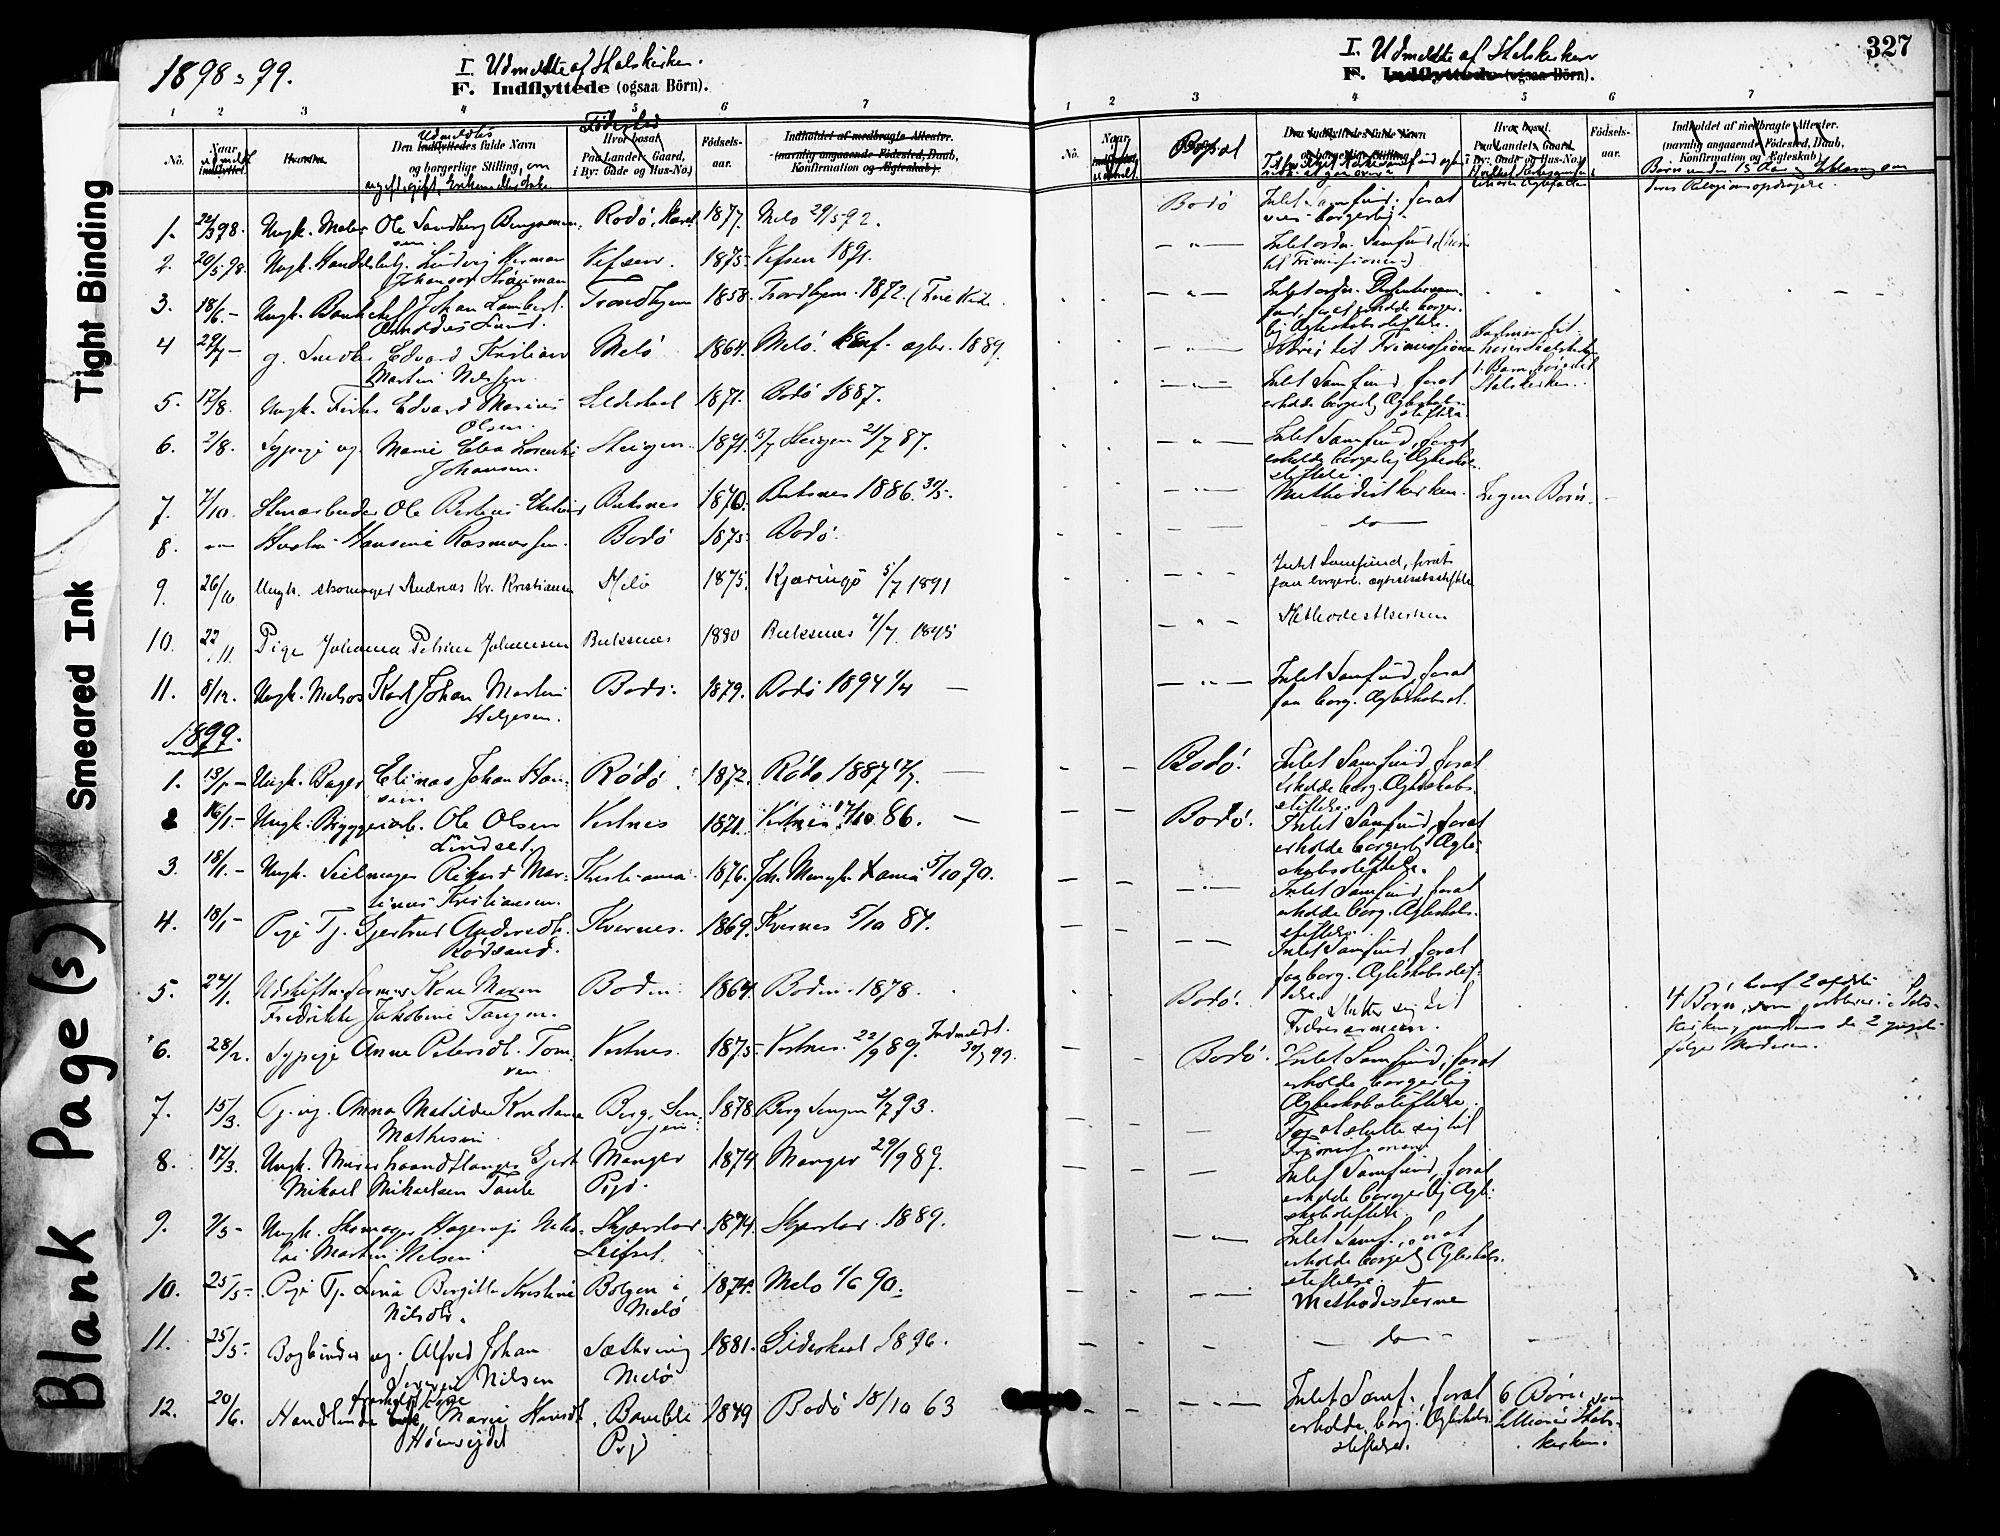 SAT, Ministerialprotokoller, klokkerbøker og fødselsregistre - Nordland, 801/L0010: Ministerialbok nr. 801A10, 1888-1899, s. 327